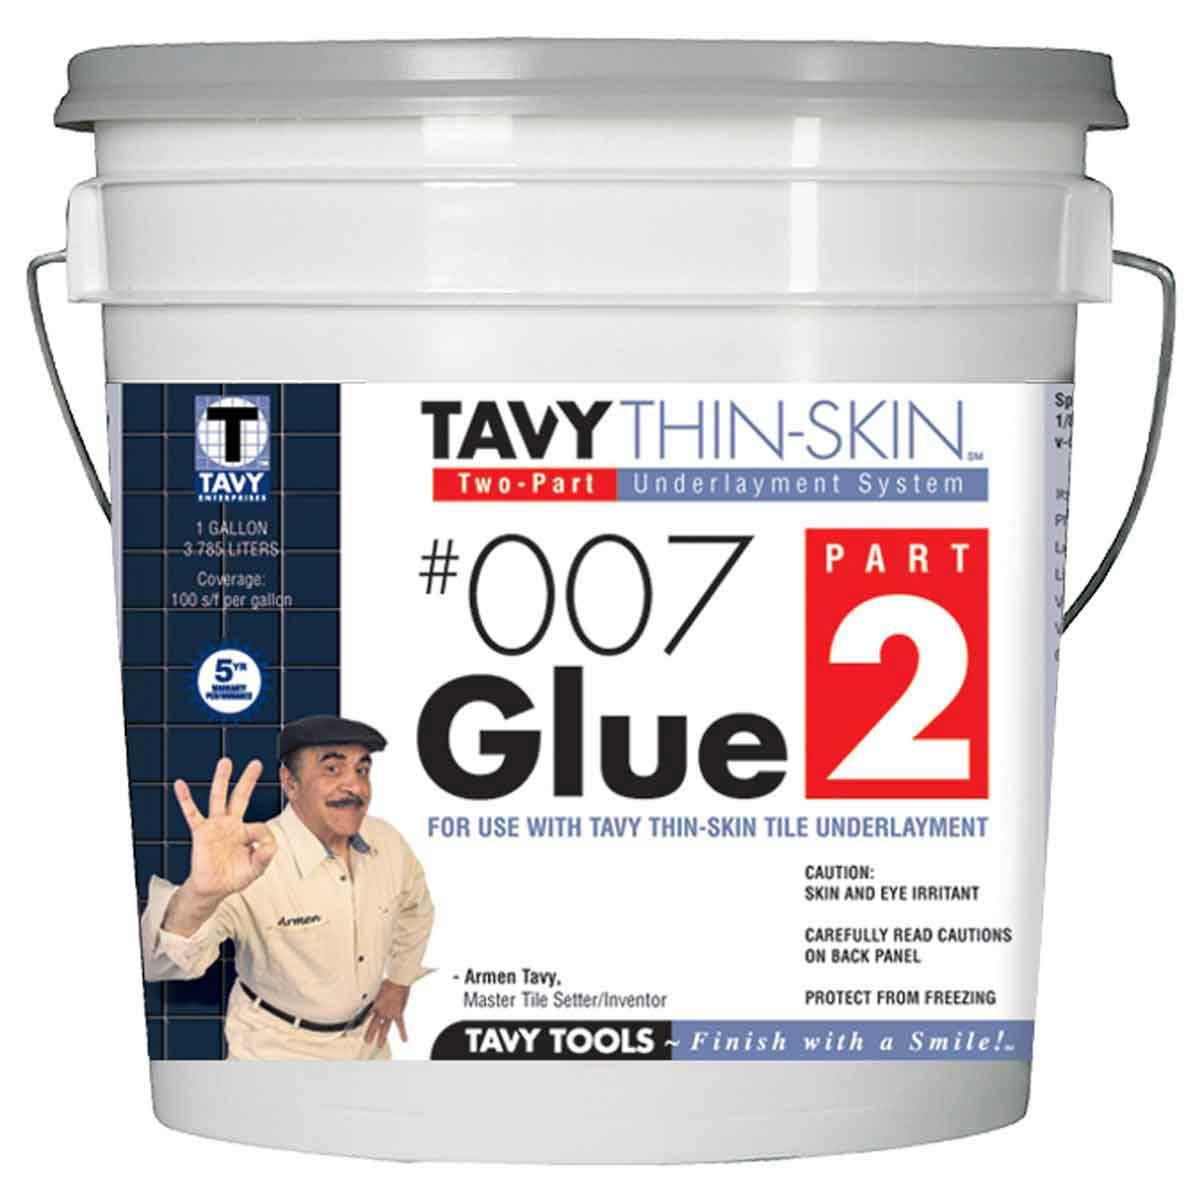 Tavy Thin-Skin membrane Glue